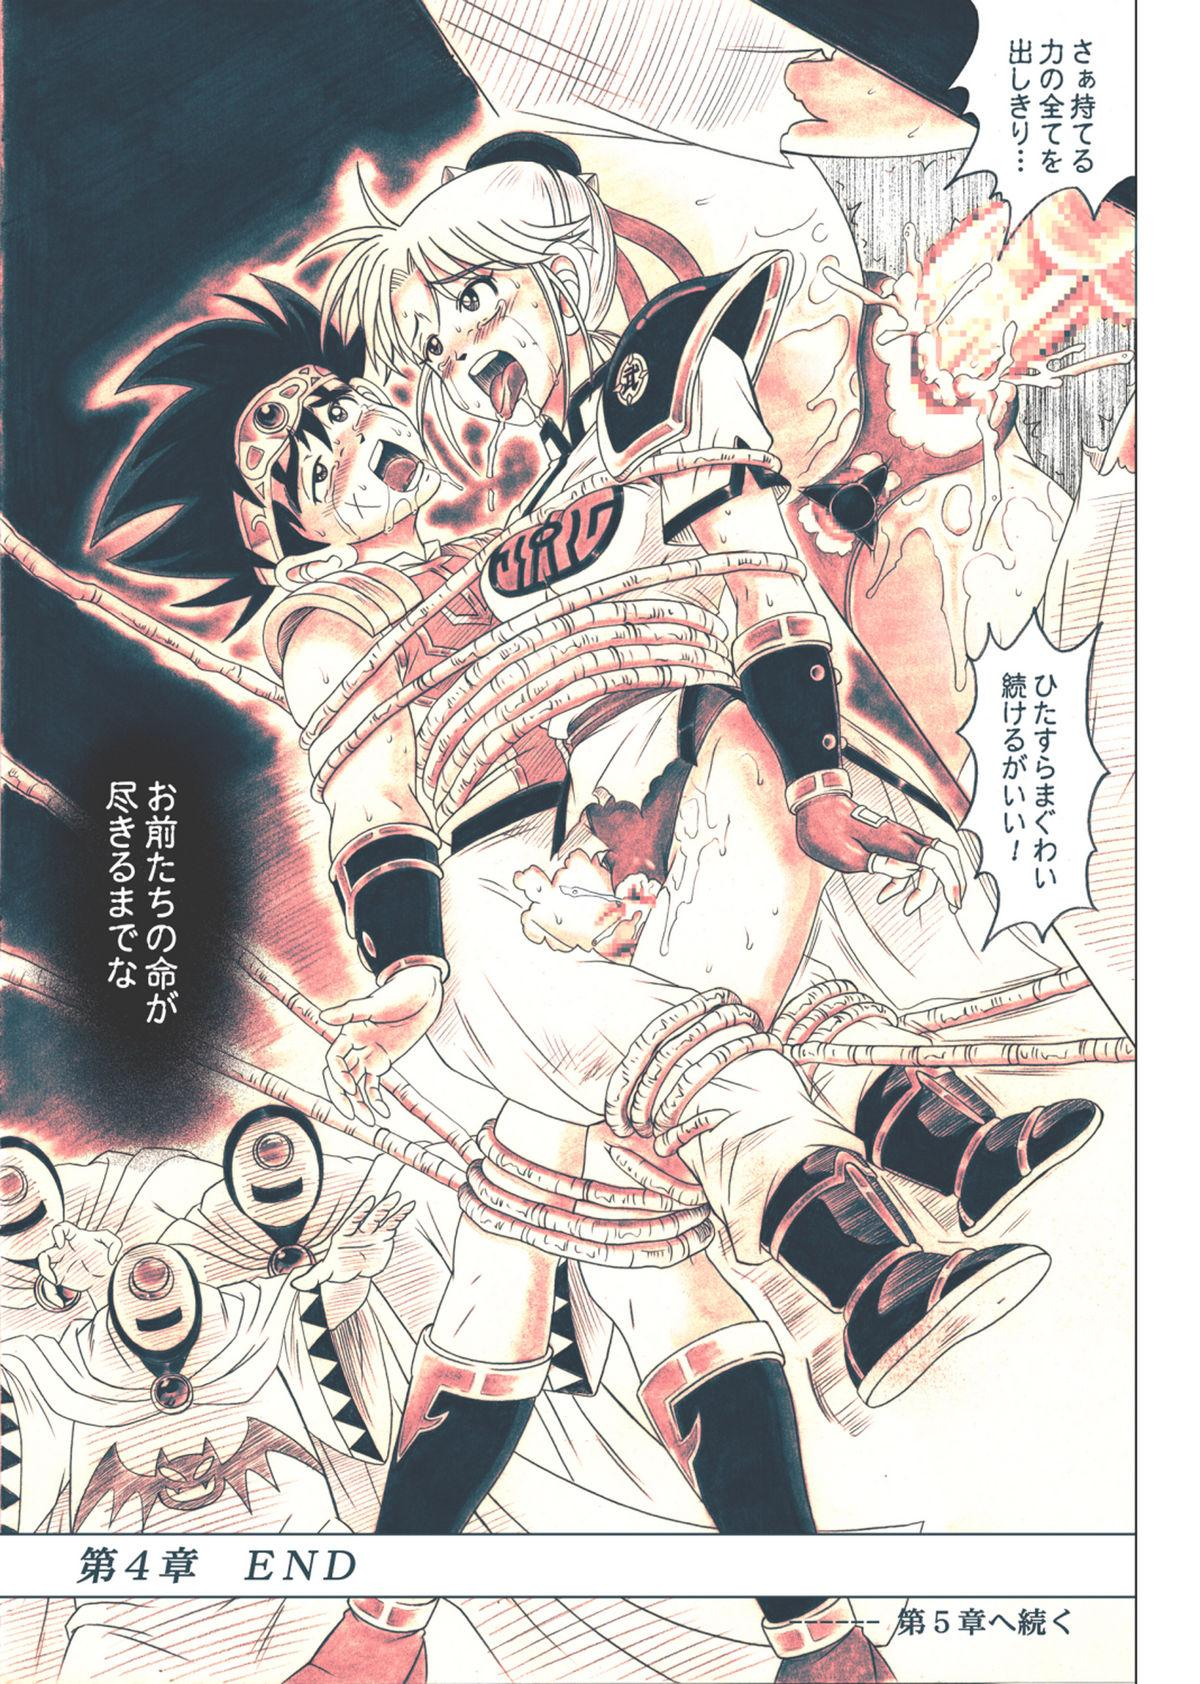 [Cyclone (Reizei, Izumi)] STAR TAC IDO ~Youkuso Haja no Doukutsu he~ Chuuhen Download edition (Dragon Warrior: Dai's Great Adventure) [Digital] 108